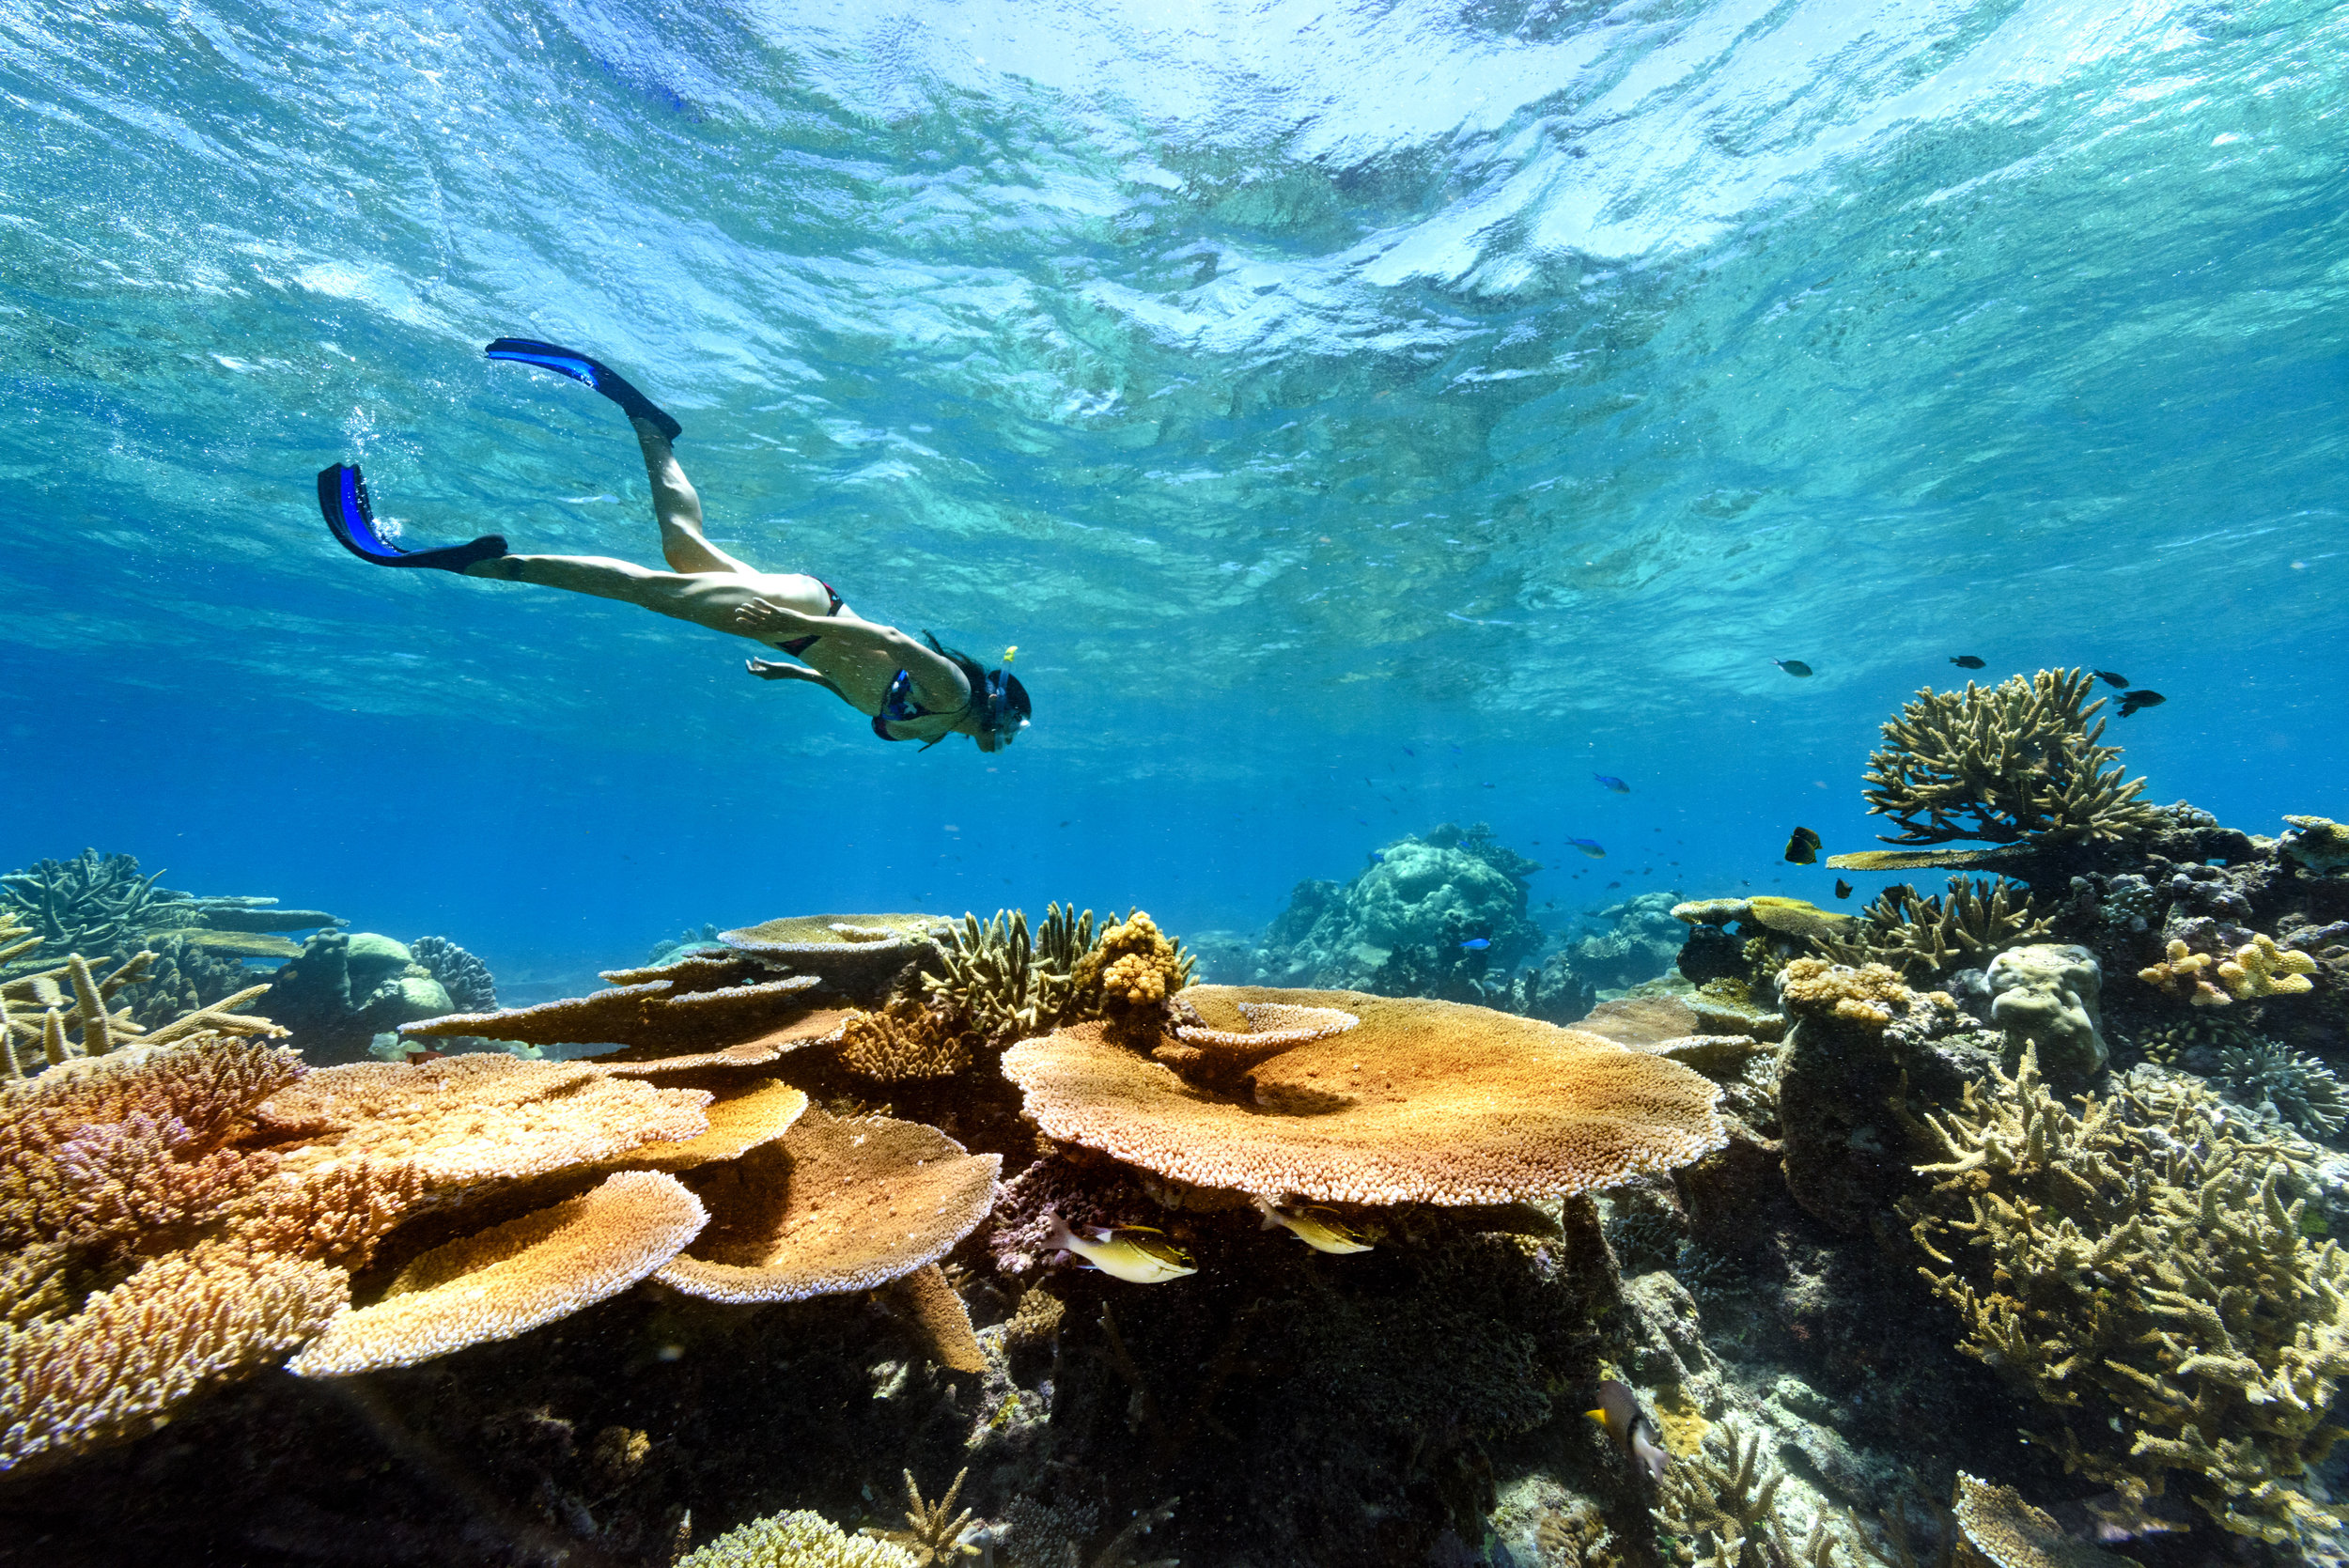 Fiji Best Resort Snorkeling - Rainbow Reef3.jpg